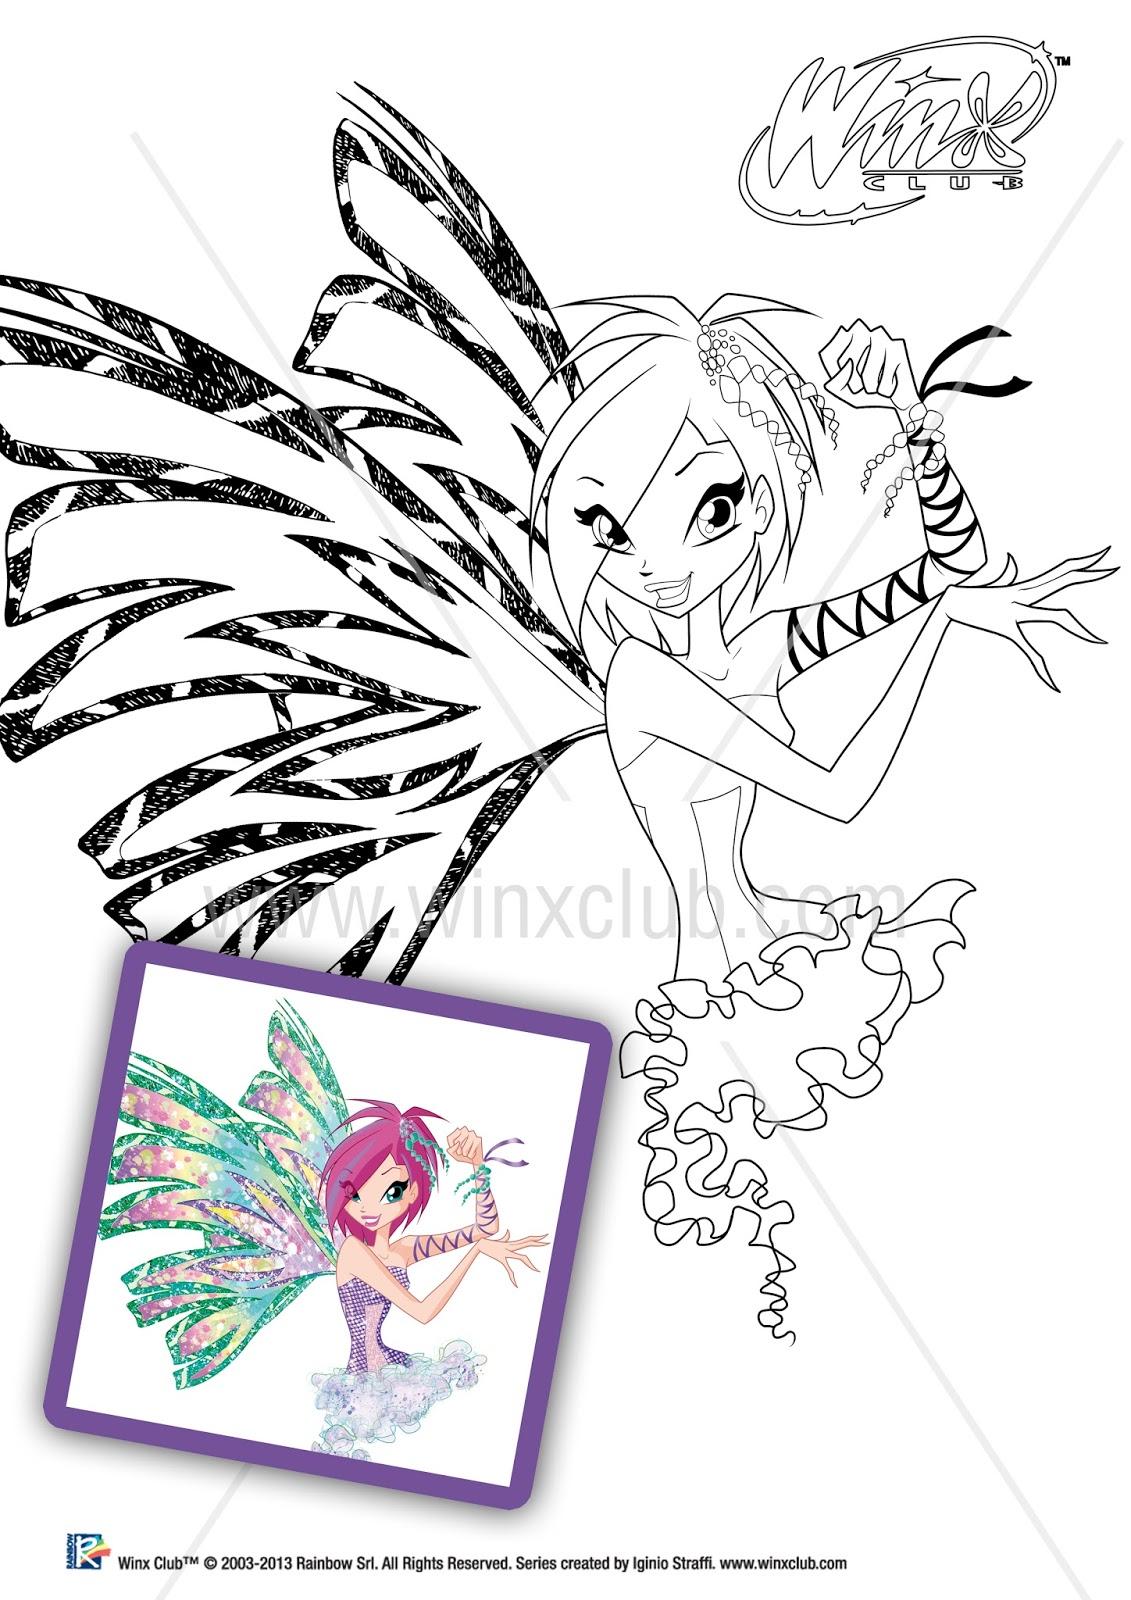 imagens para colorir winks - Desenhos do CLUBE DAS WINX para colorir Hello Kids